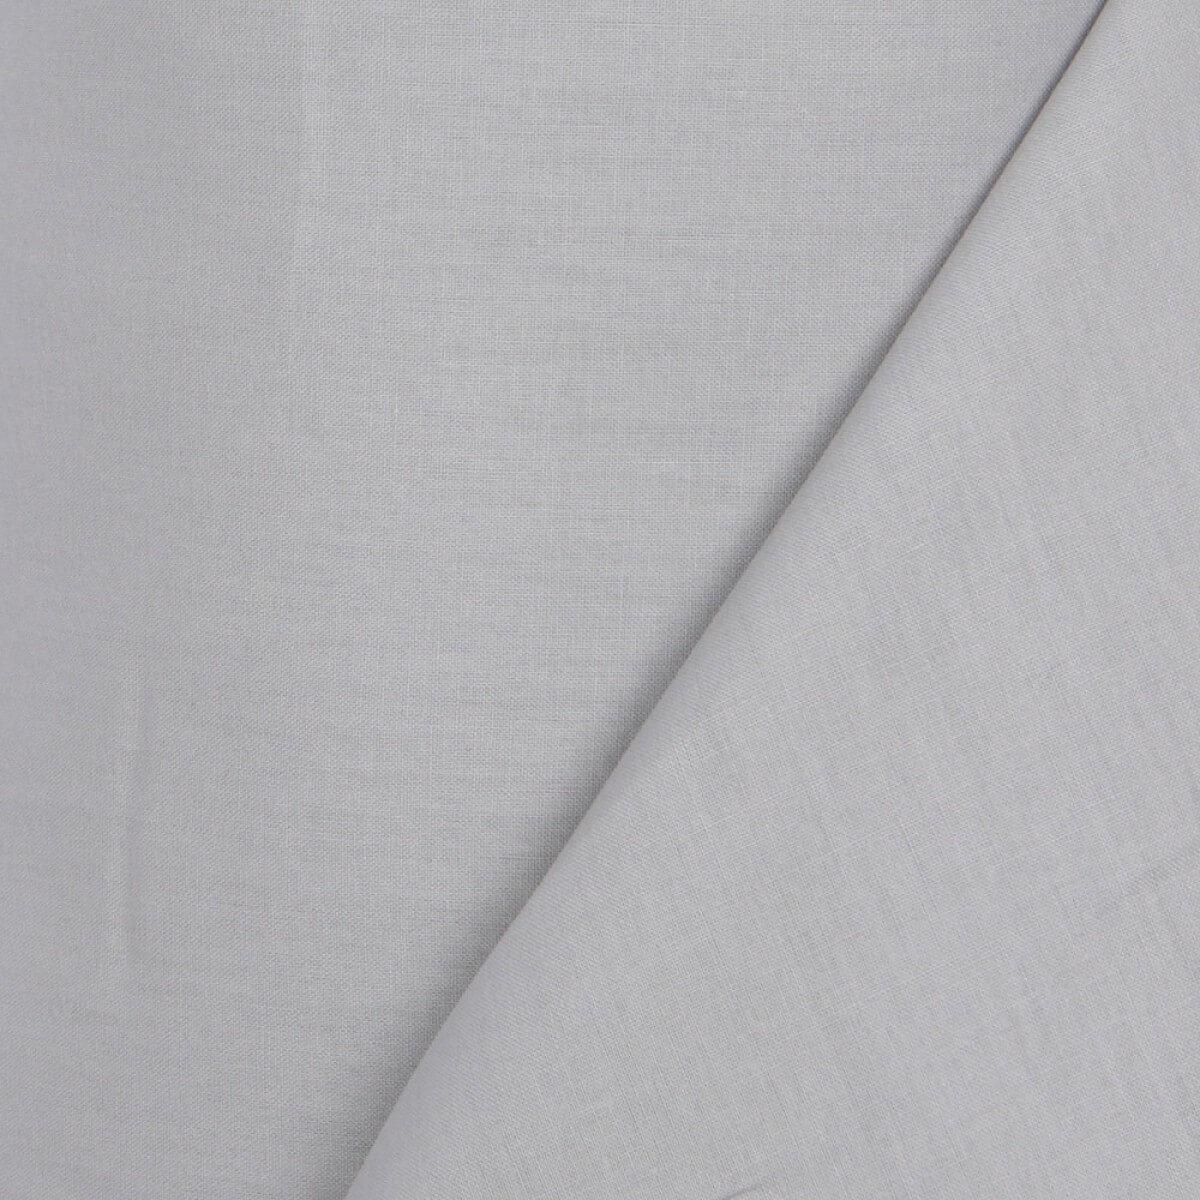 Tissu toile à drap - 240cm - Gris - Mercerie